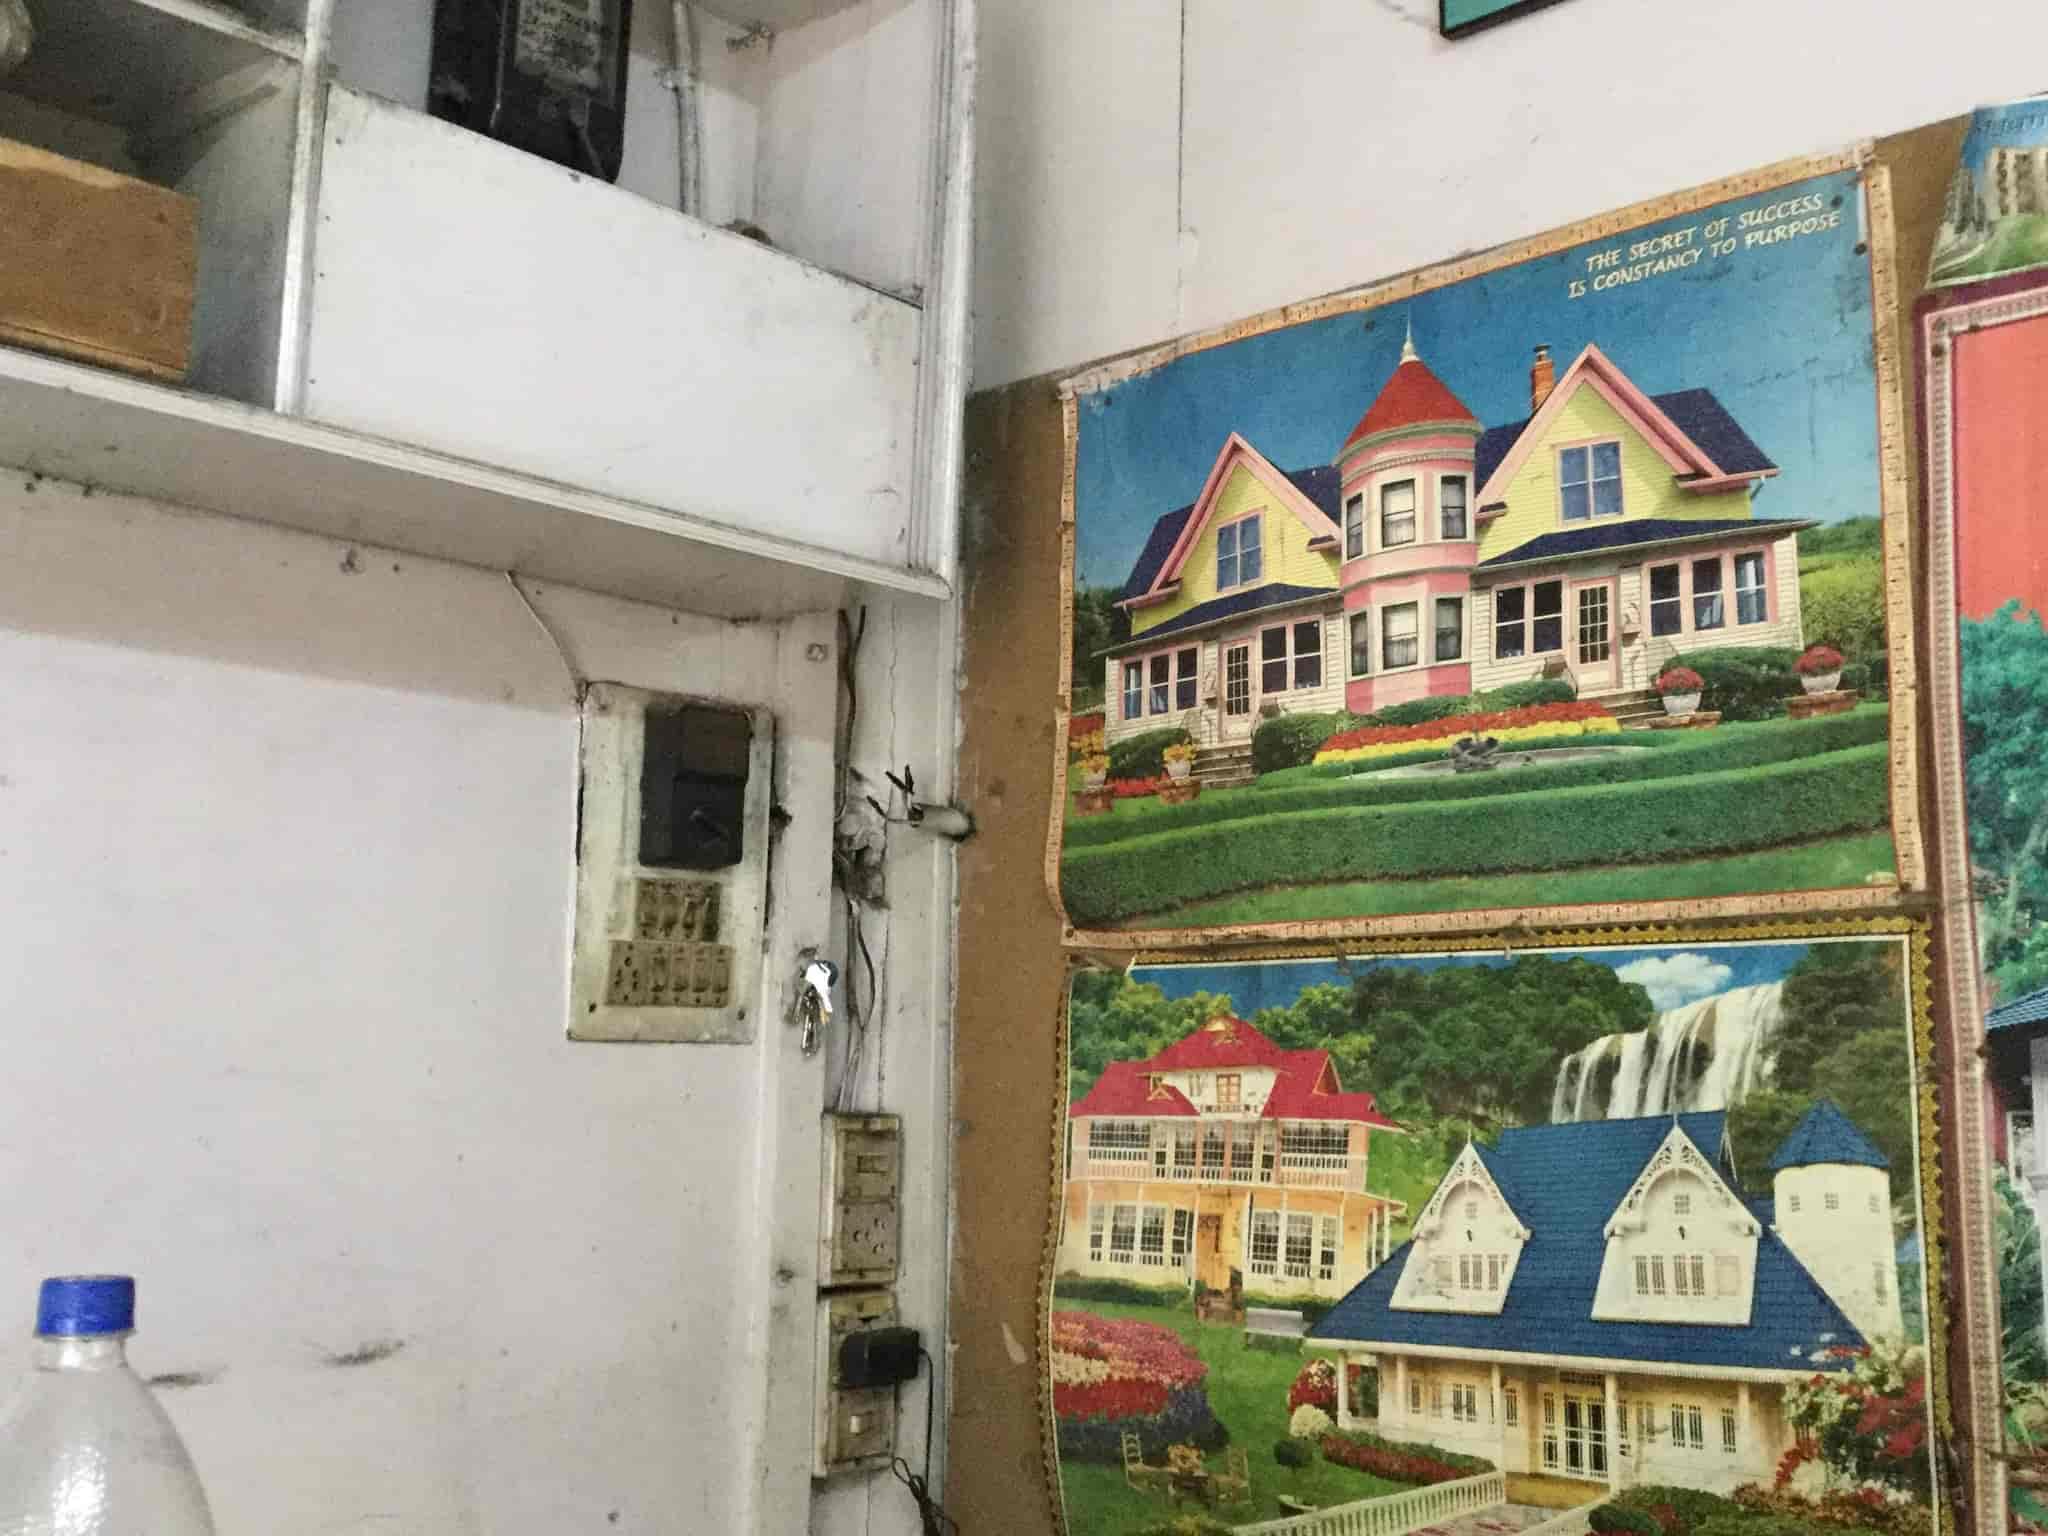 Gagan Properties Photos Kirti Nagar Delhi Pictures Images